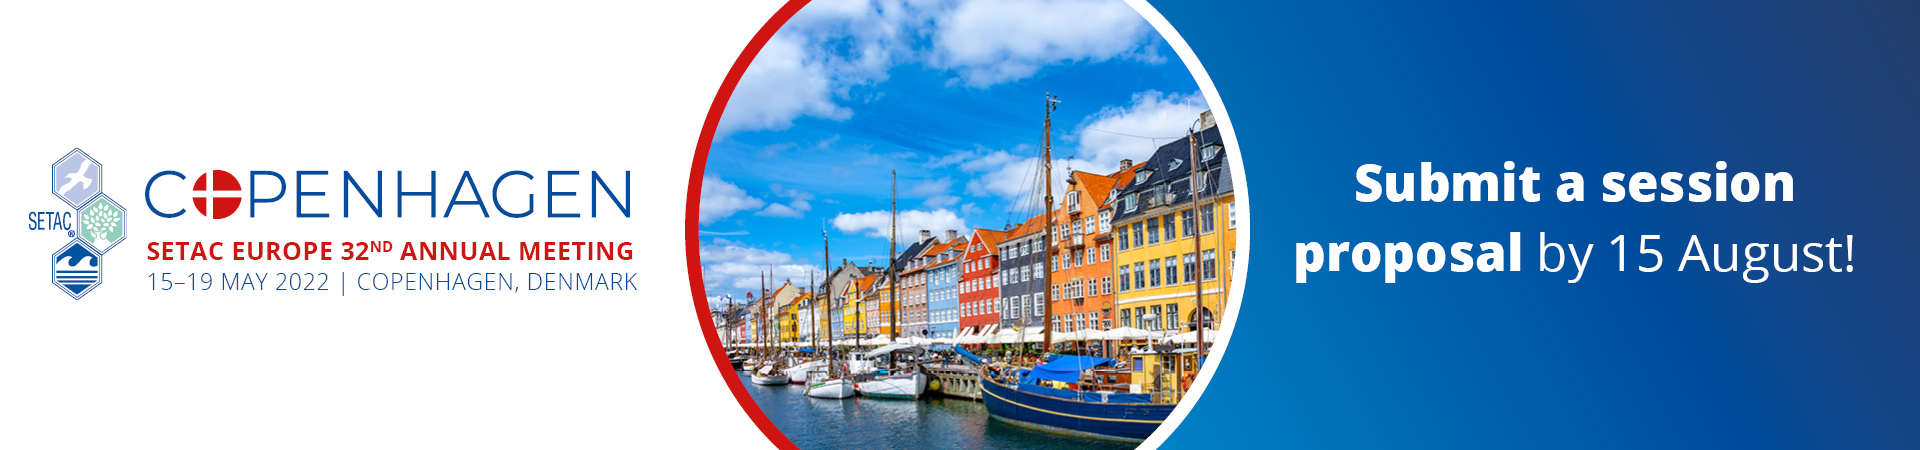 SETAC Copenhagen